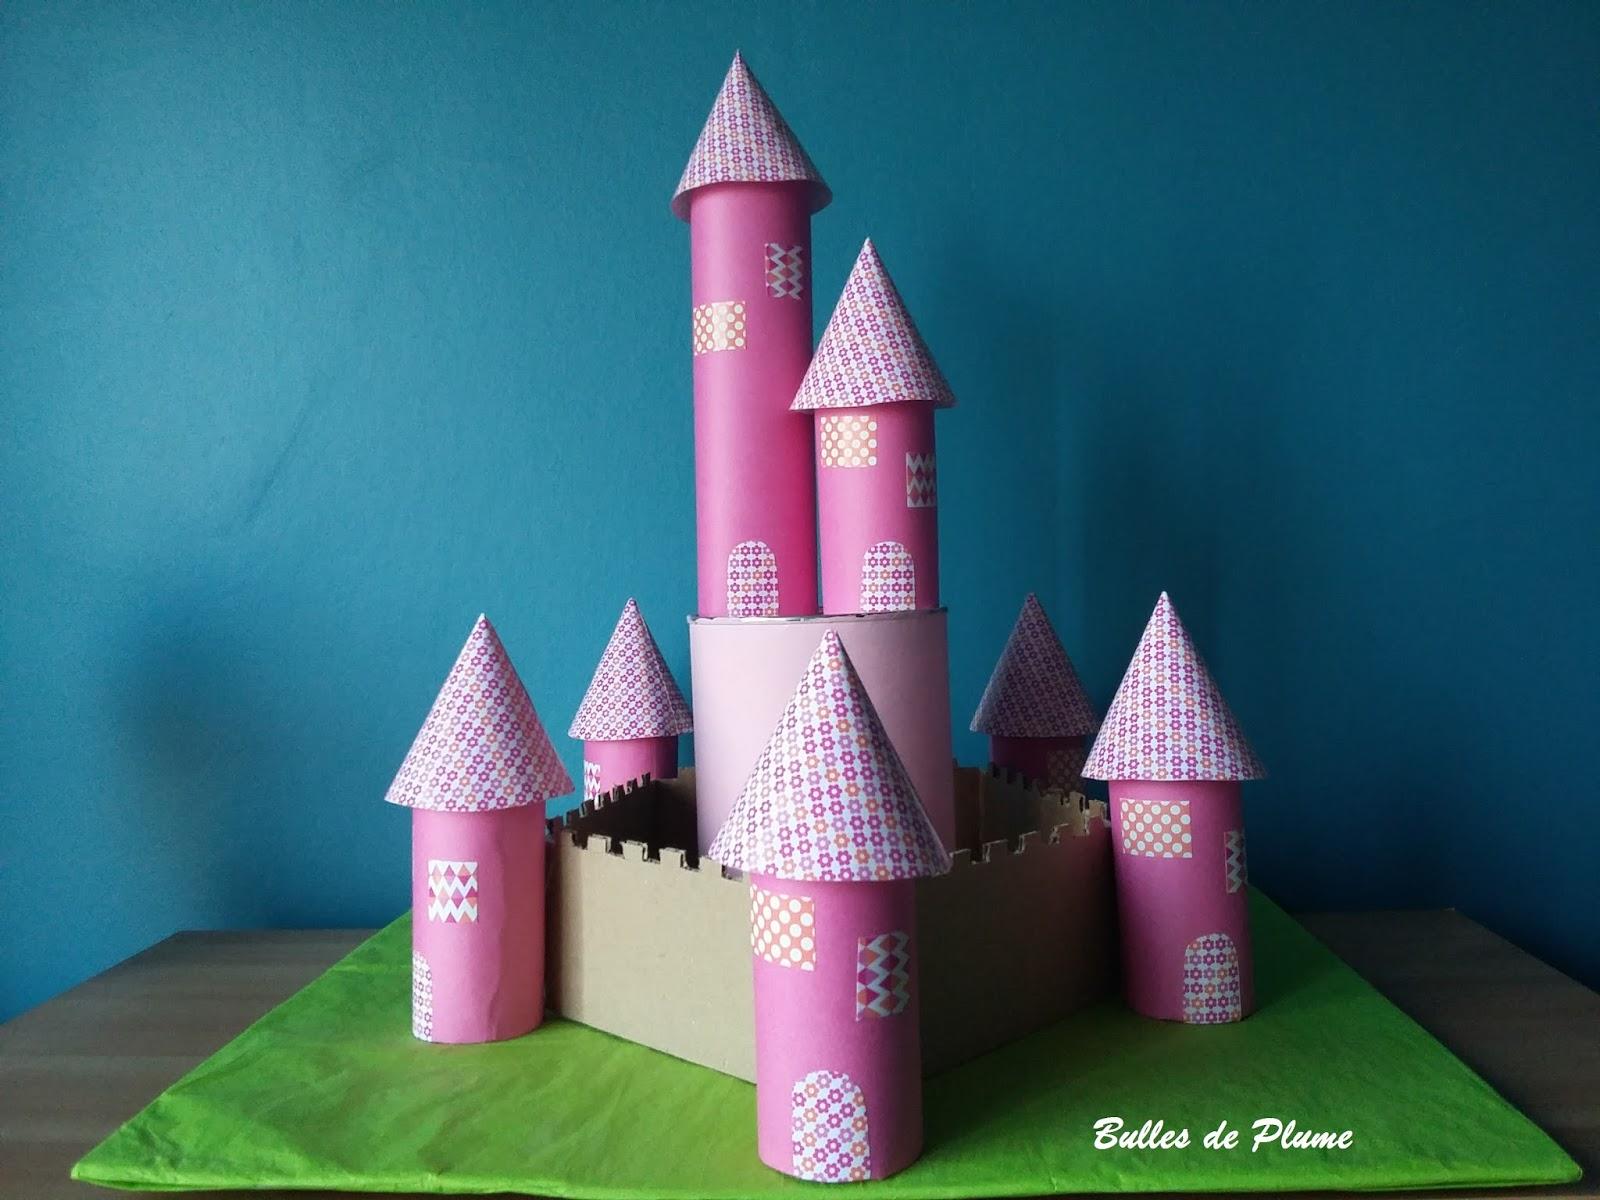 bulles de plume diy ch teau de princesse en carton. Black Bedroom Furniture Sets. Home Design Ideas